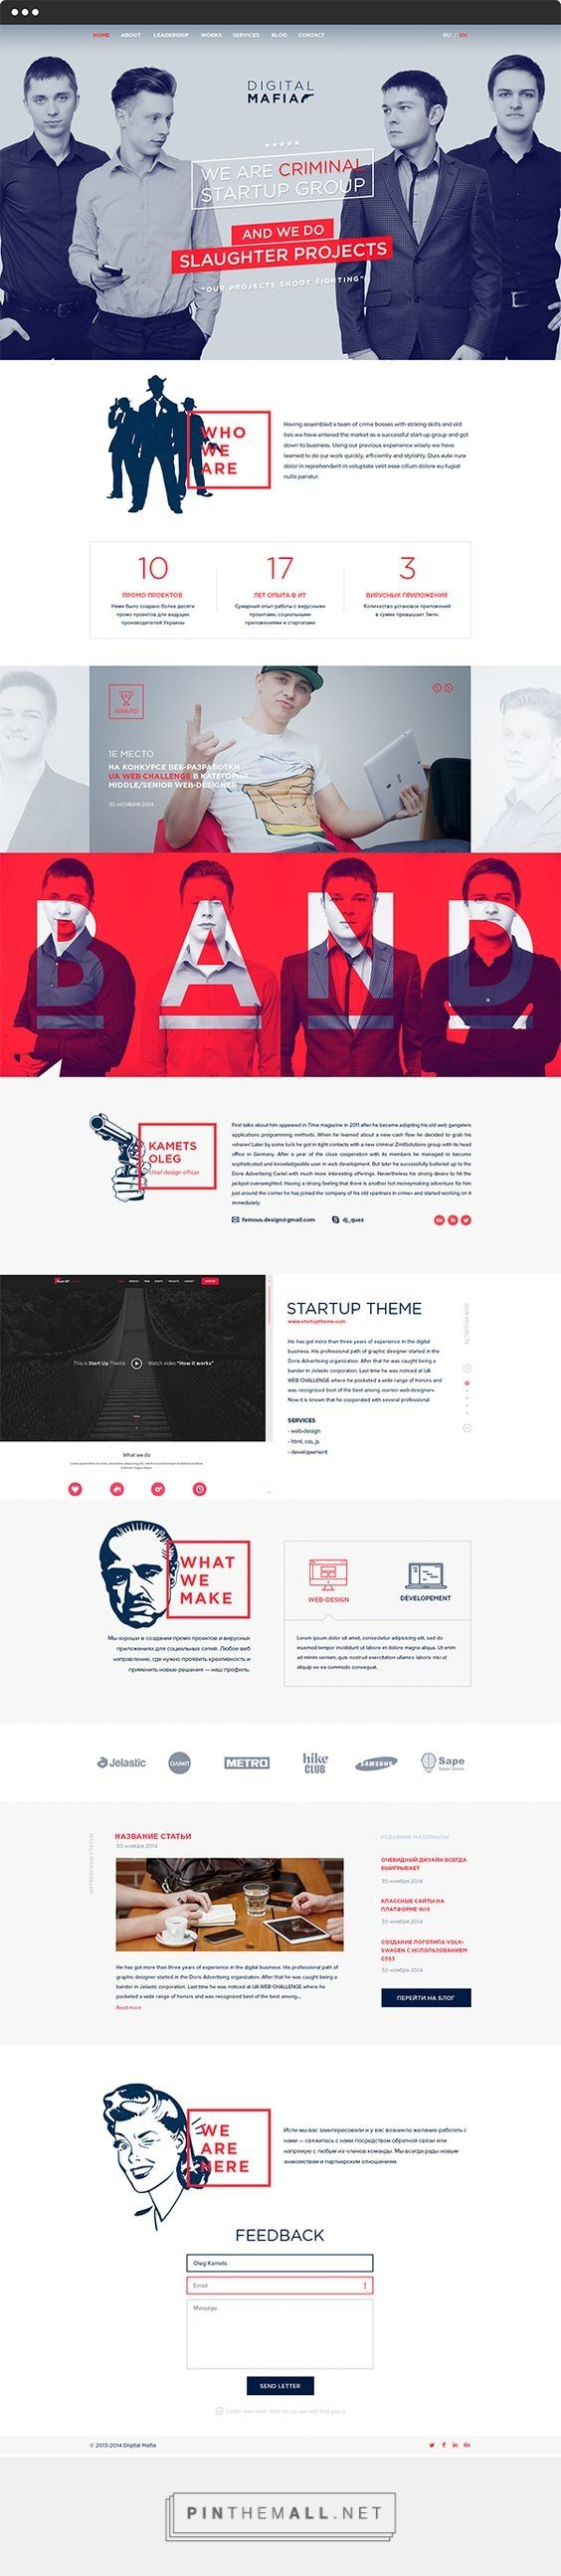 Digital Mafia Production Agency Web Design by Oleg Kamets | Fivestar Branding – Design and Branding Agency & Inspiration Gallery